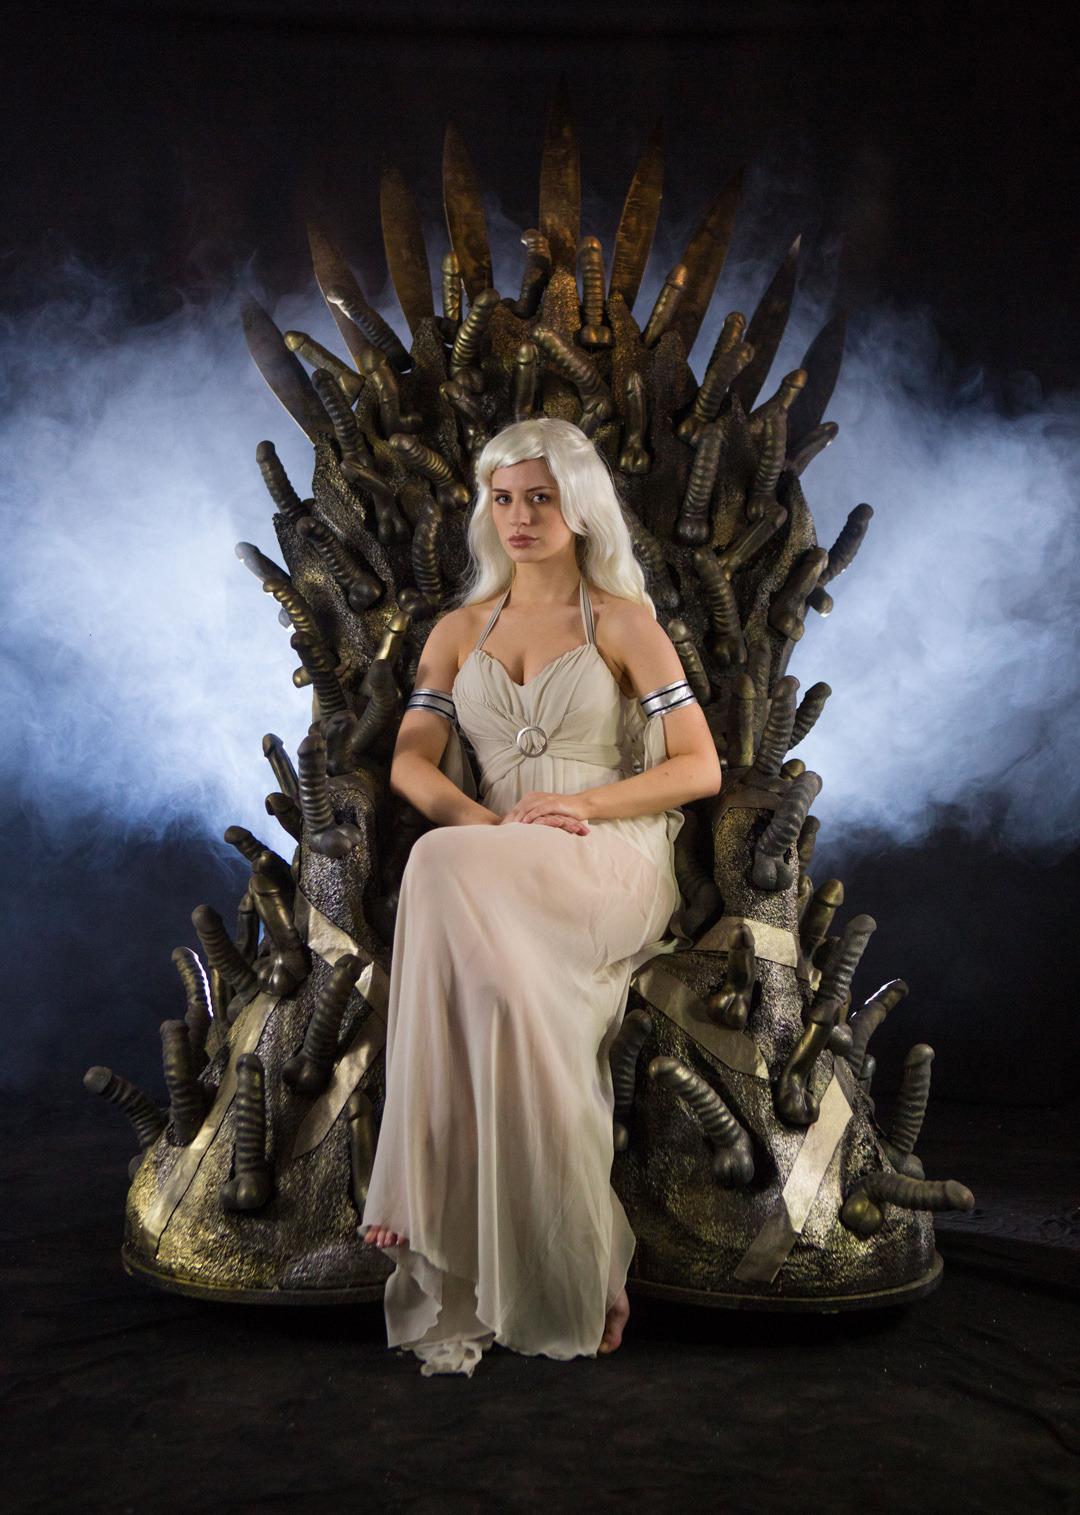 Game of bones : khaleesi sur le Bondara Rubber Throne fait avec 200 sextoys godmichets